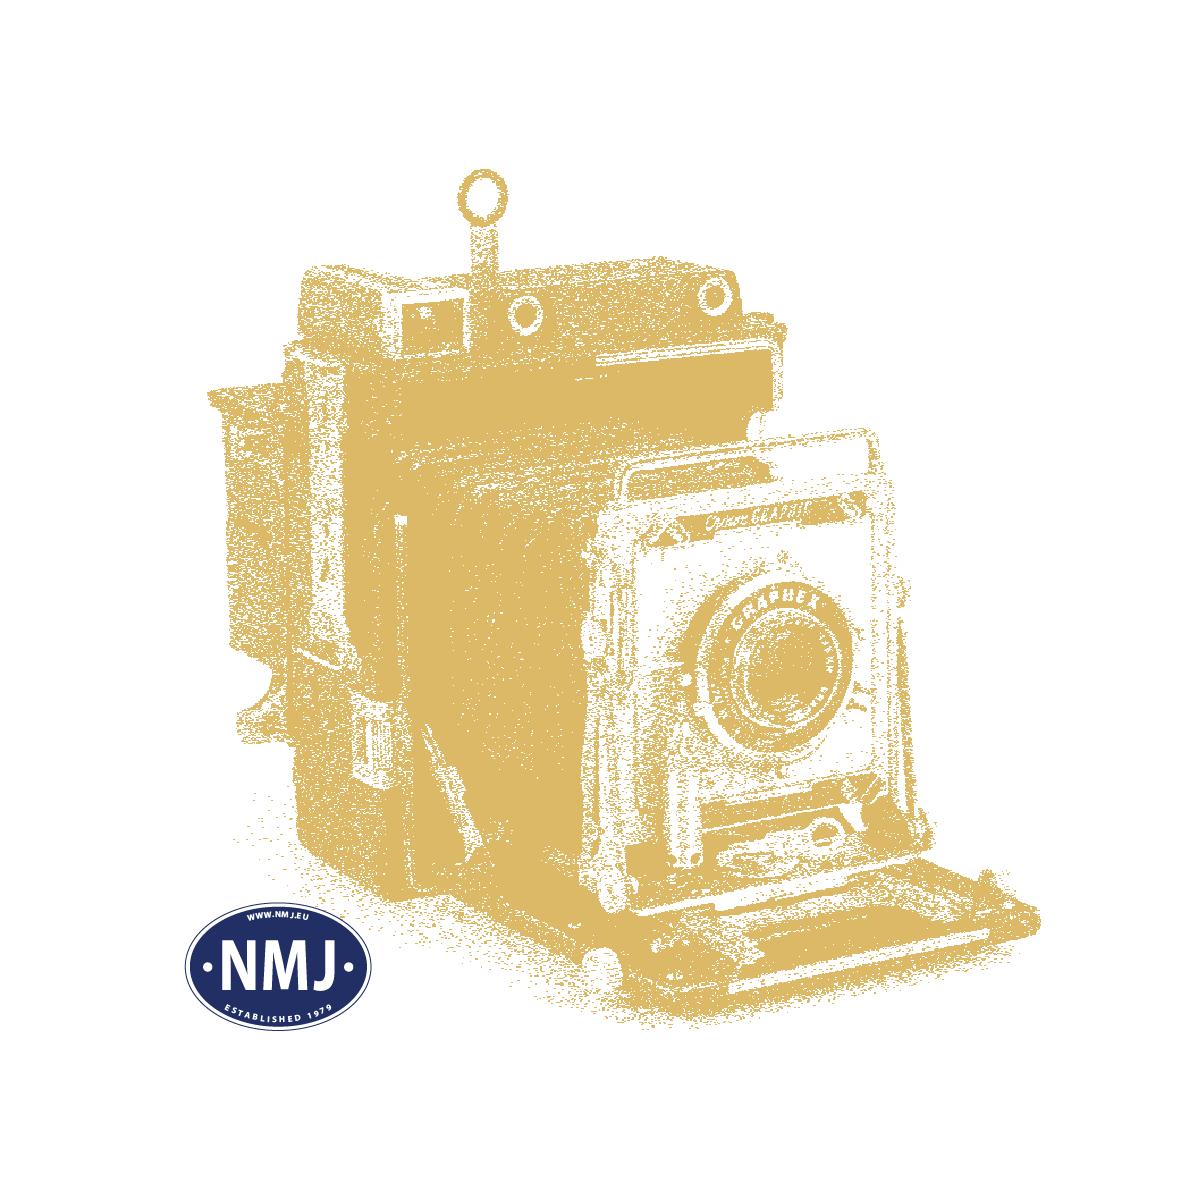 NOC60829 - Malingsrulle for vei